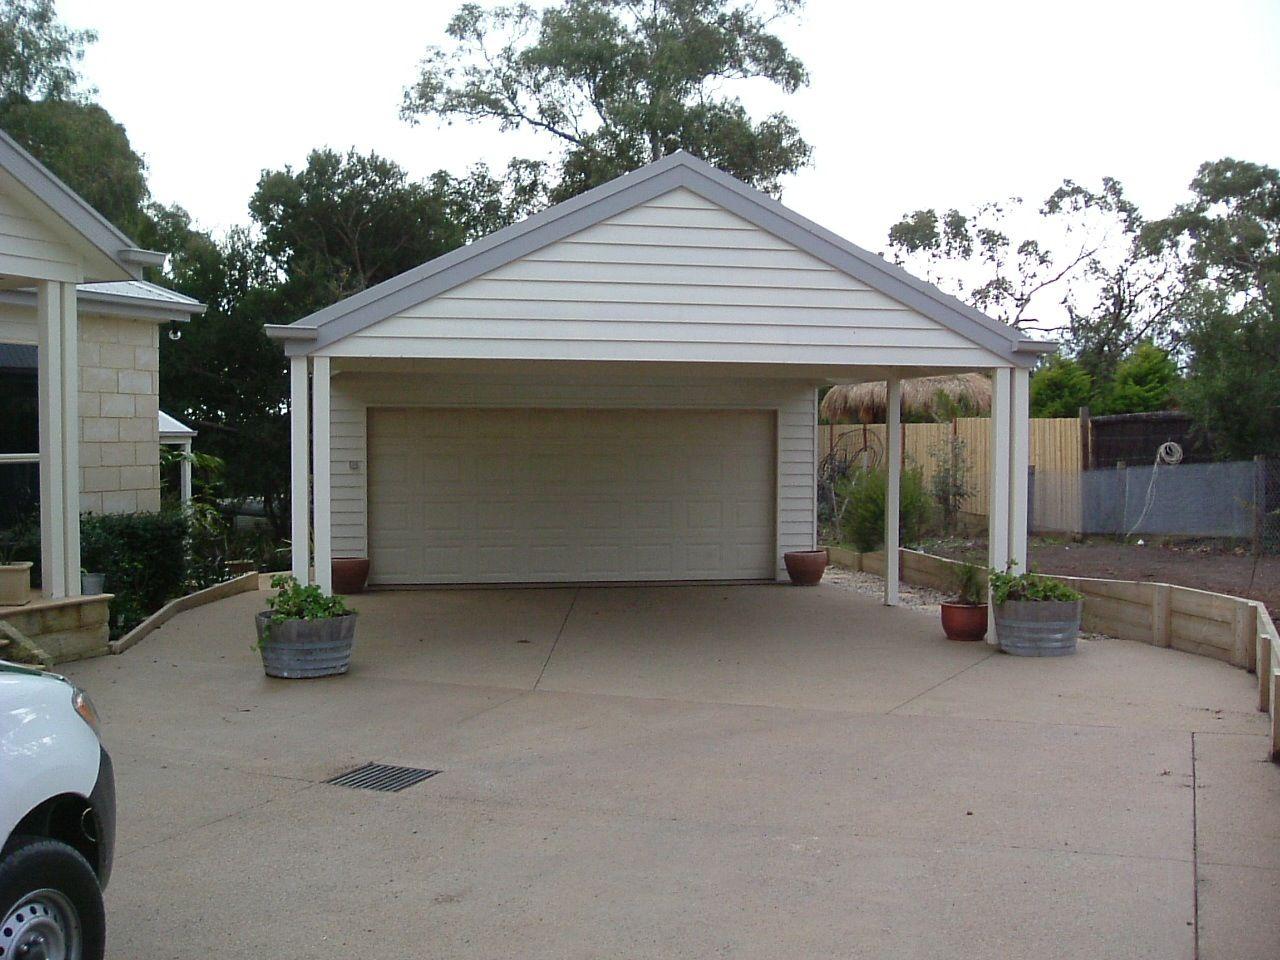 carport ideas (With images) Carport, Carport garage